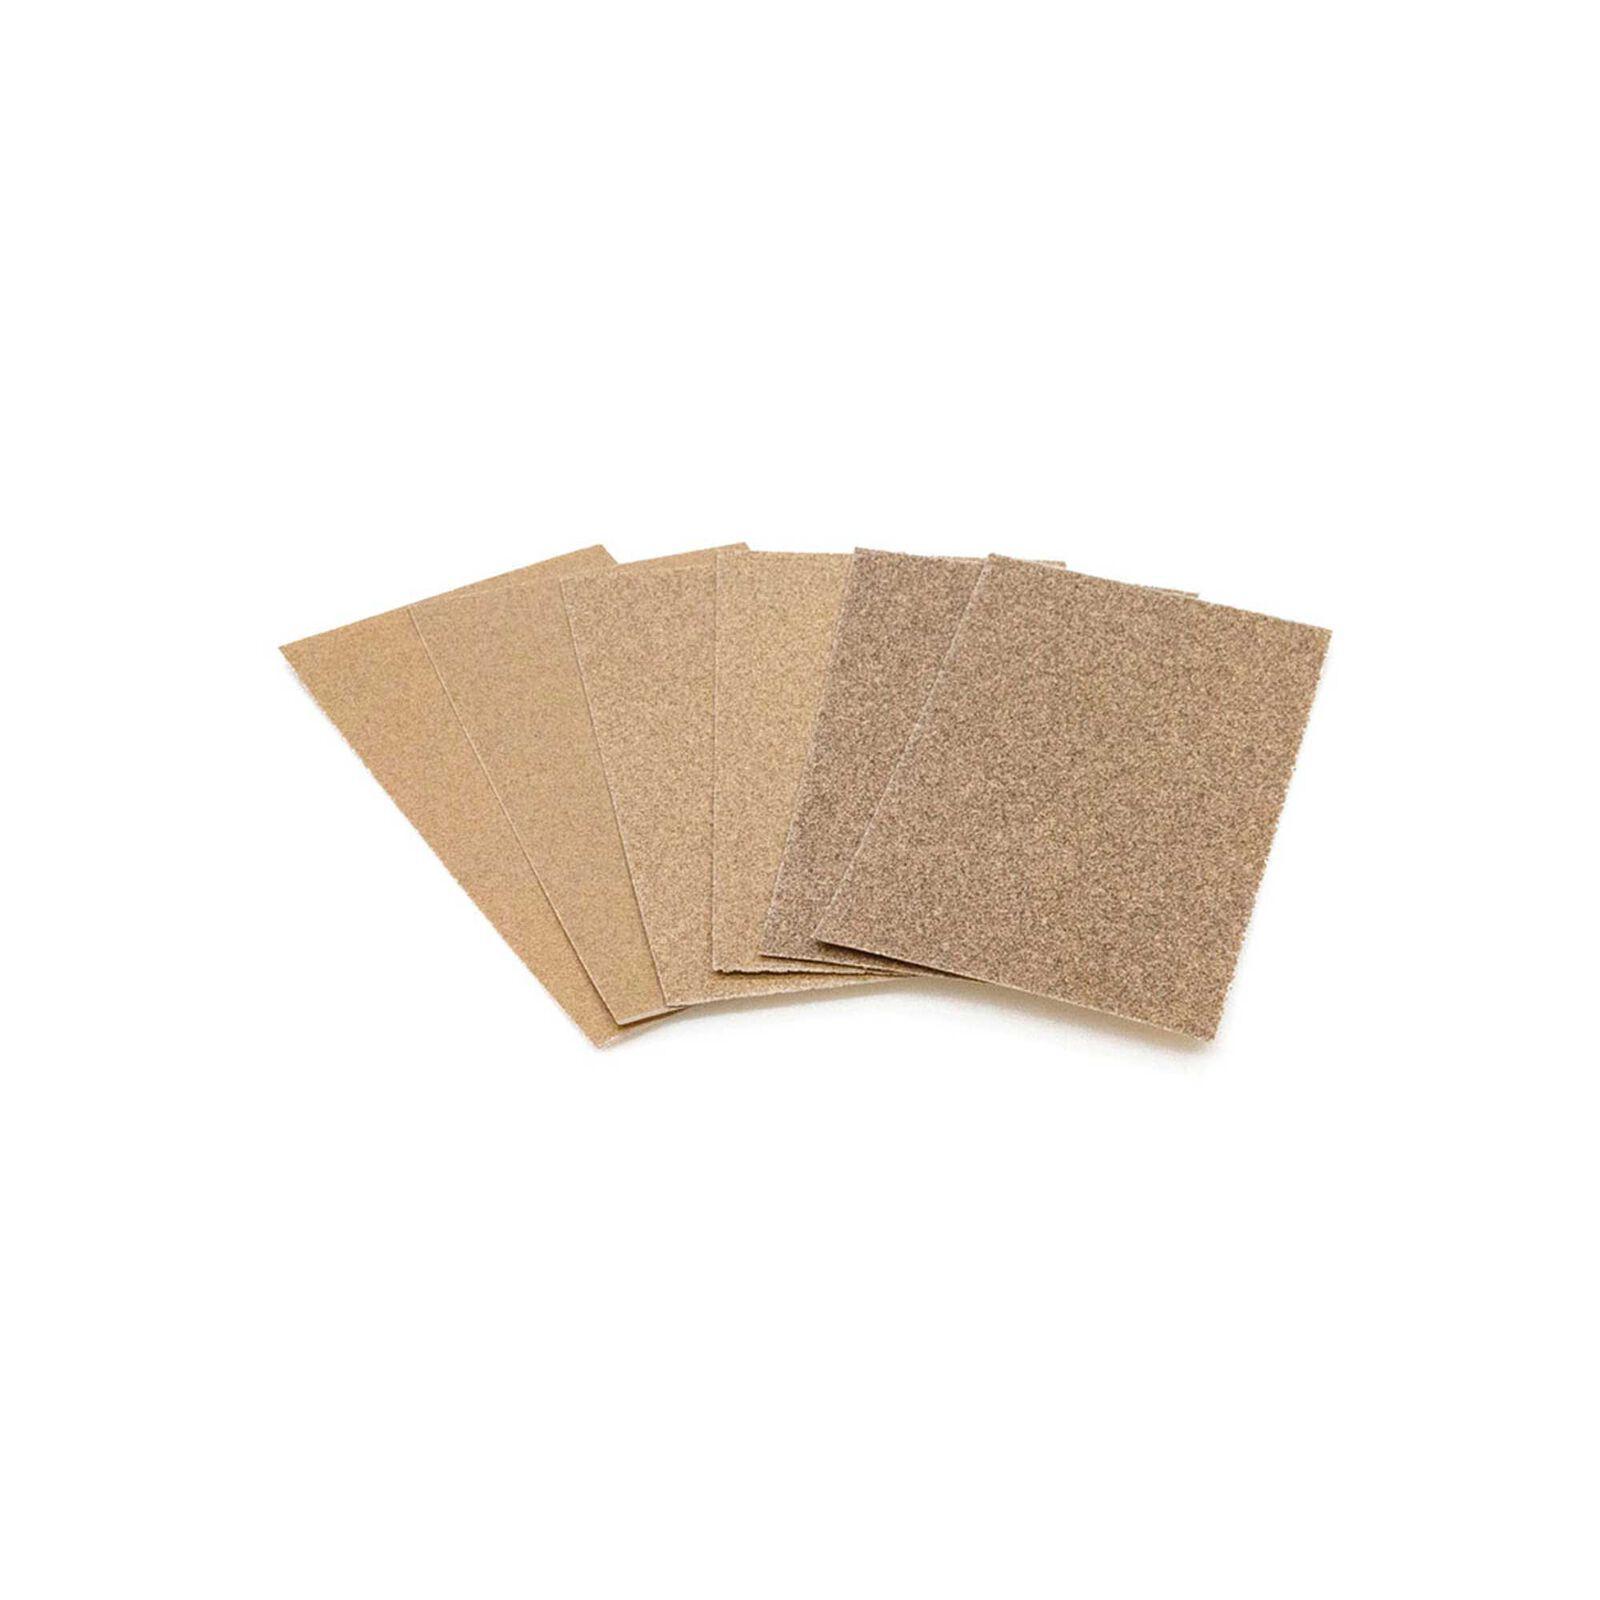 Sandpaper Assortment